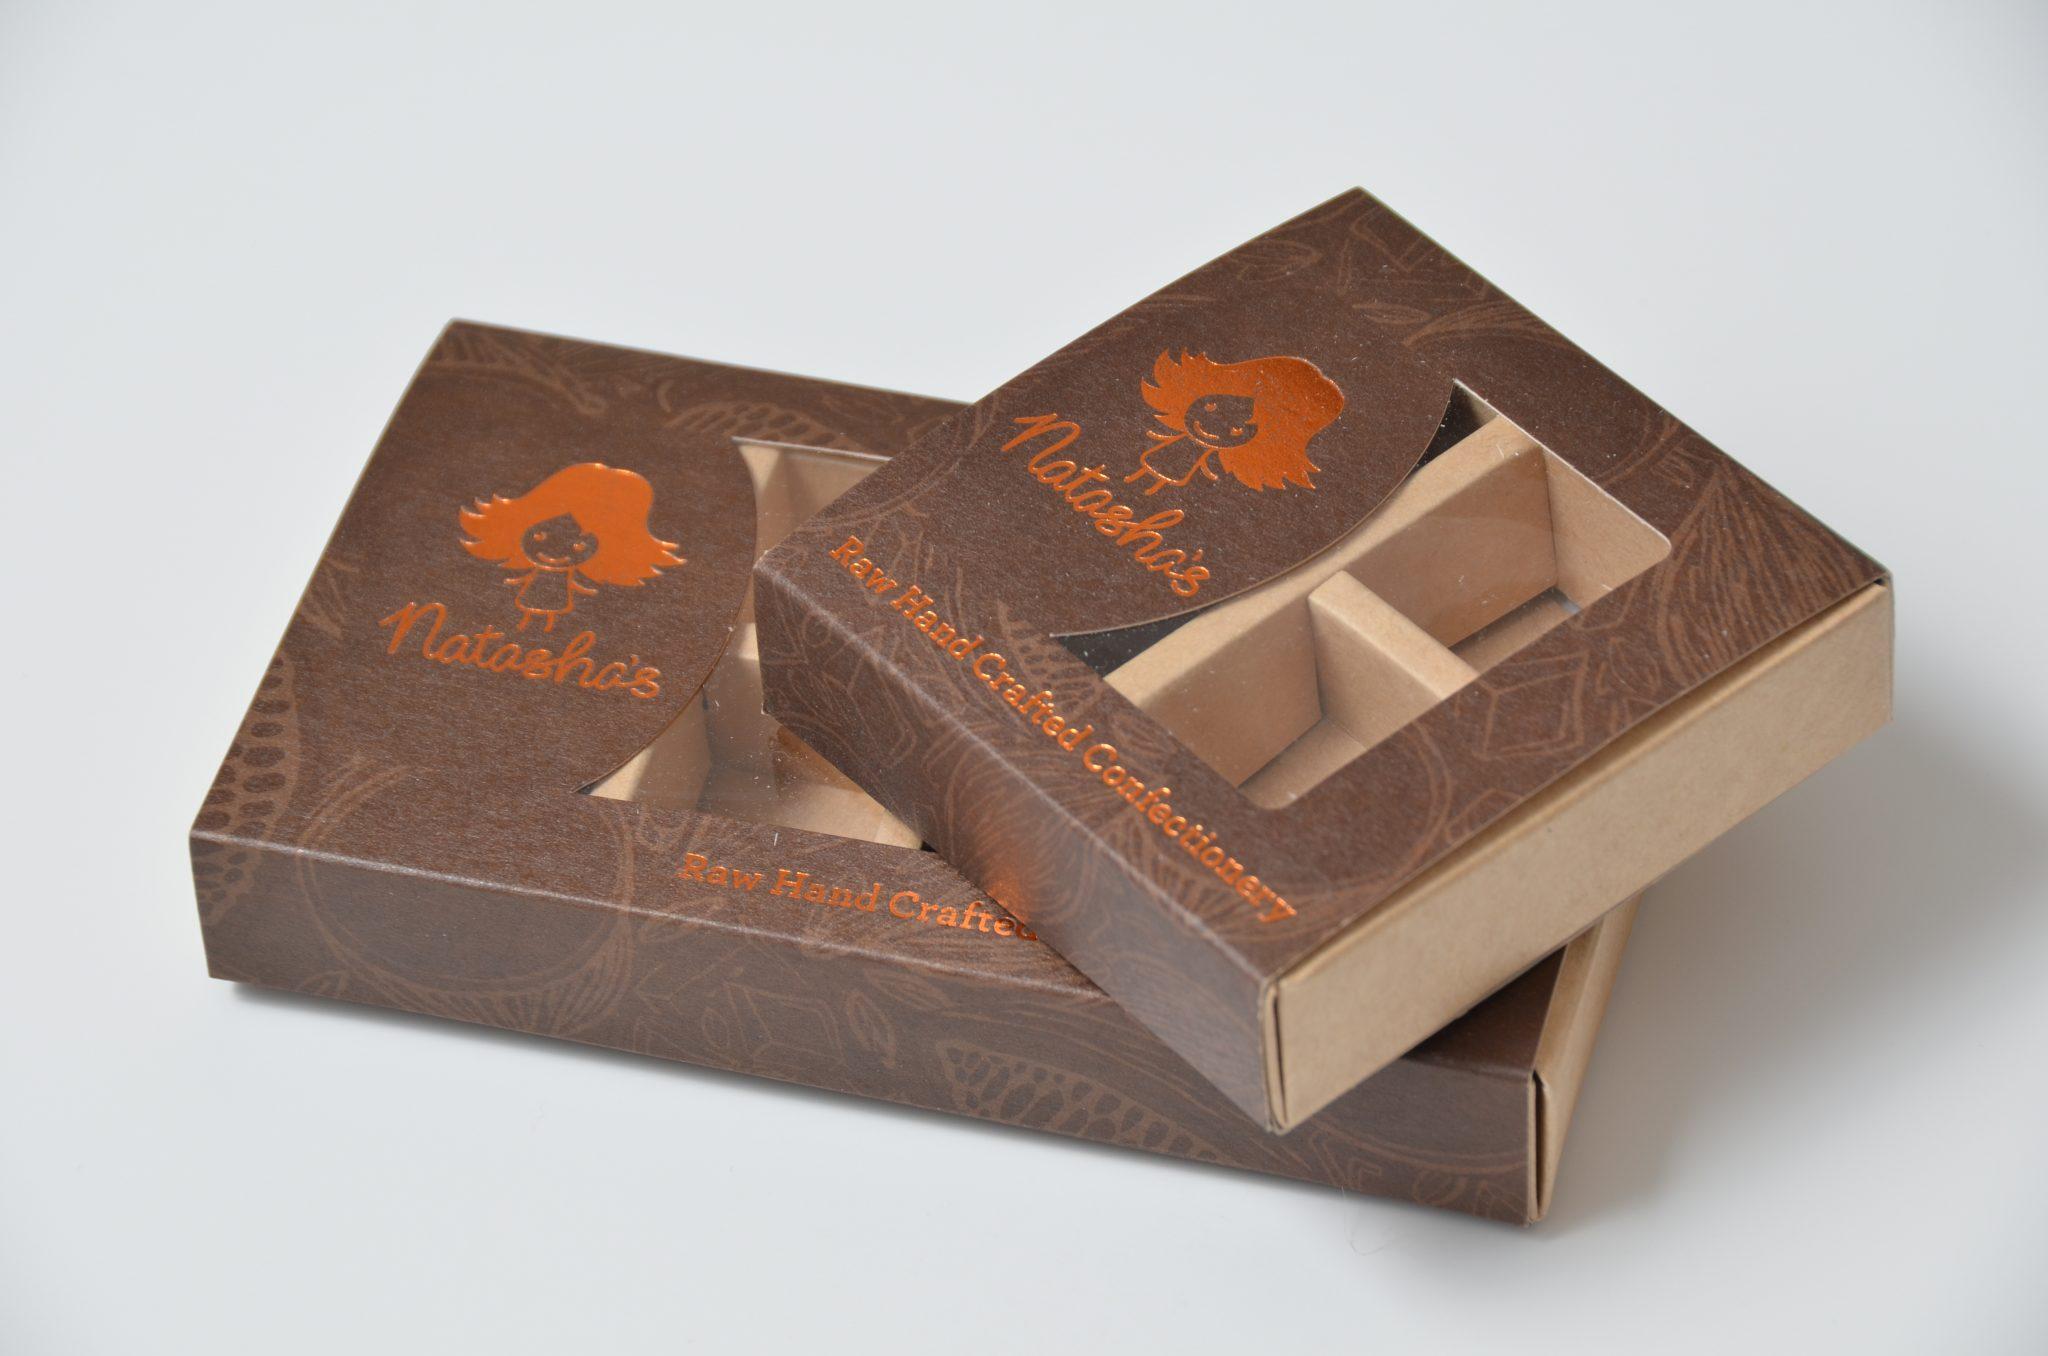 Bespoke Chocolate Boxes 4 & 8 Packs